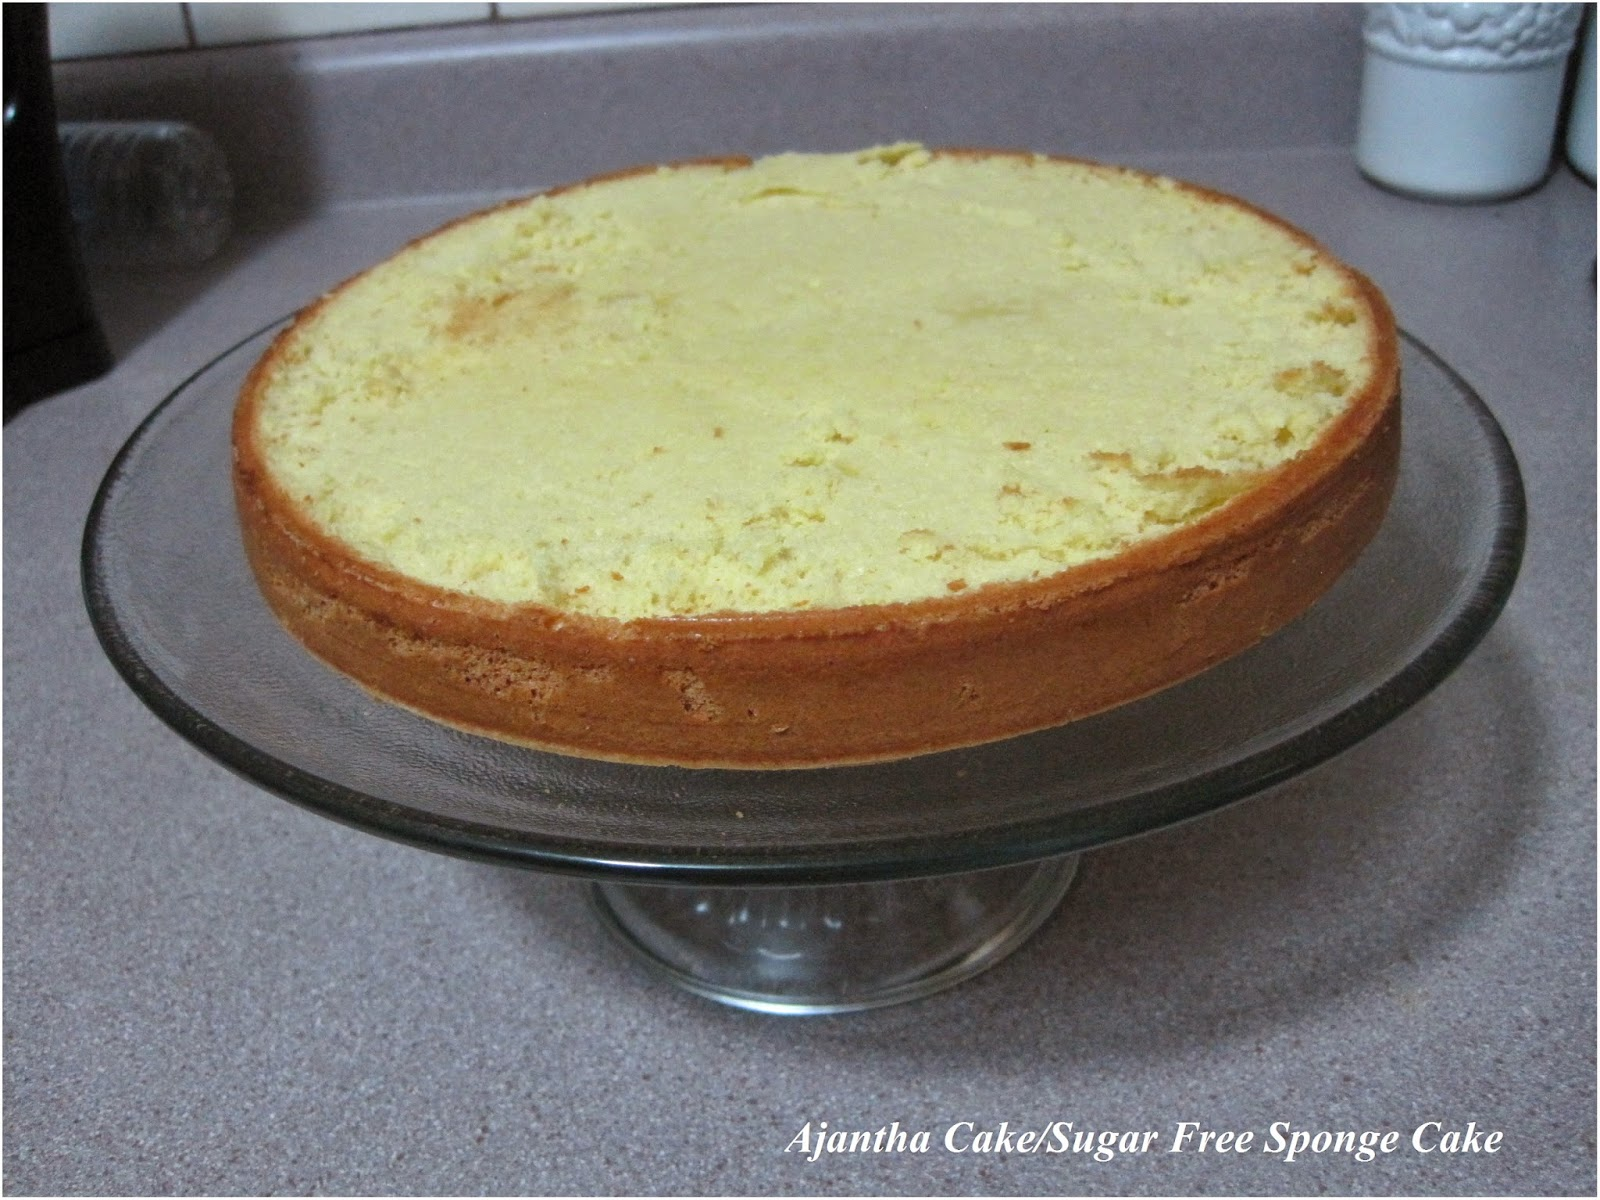 Ajantha Cakes/Sugar Free Sponge Cake